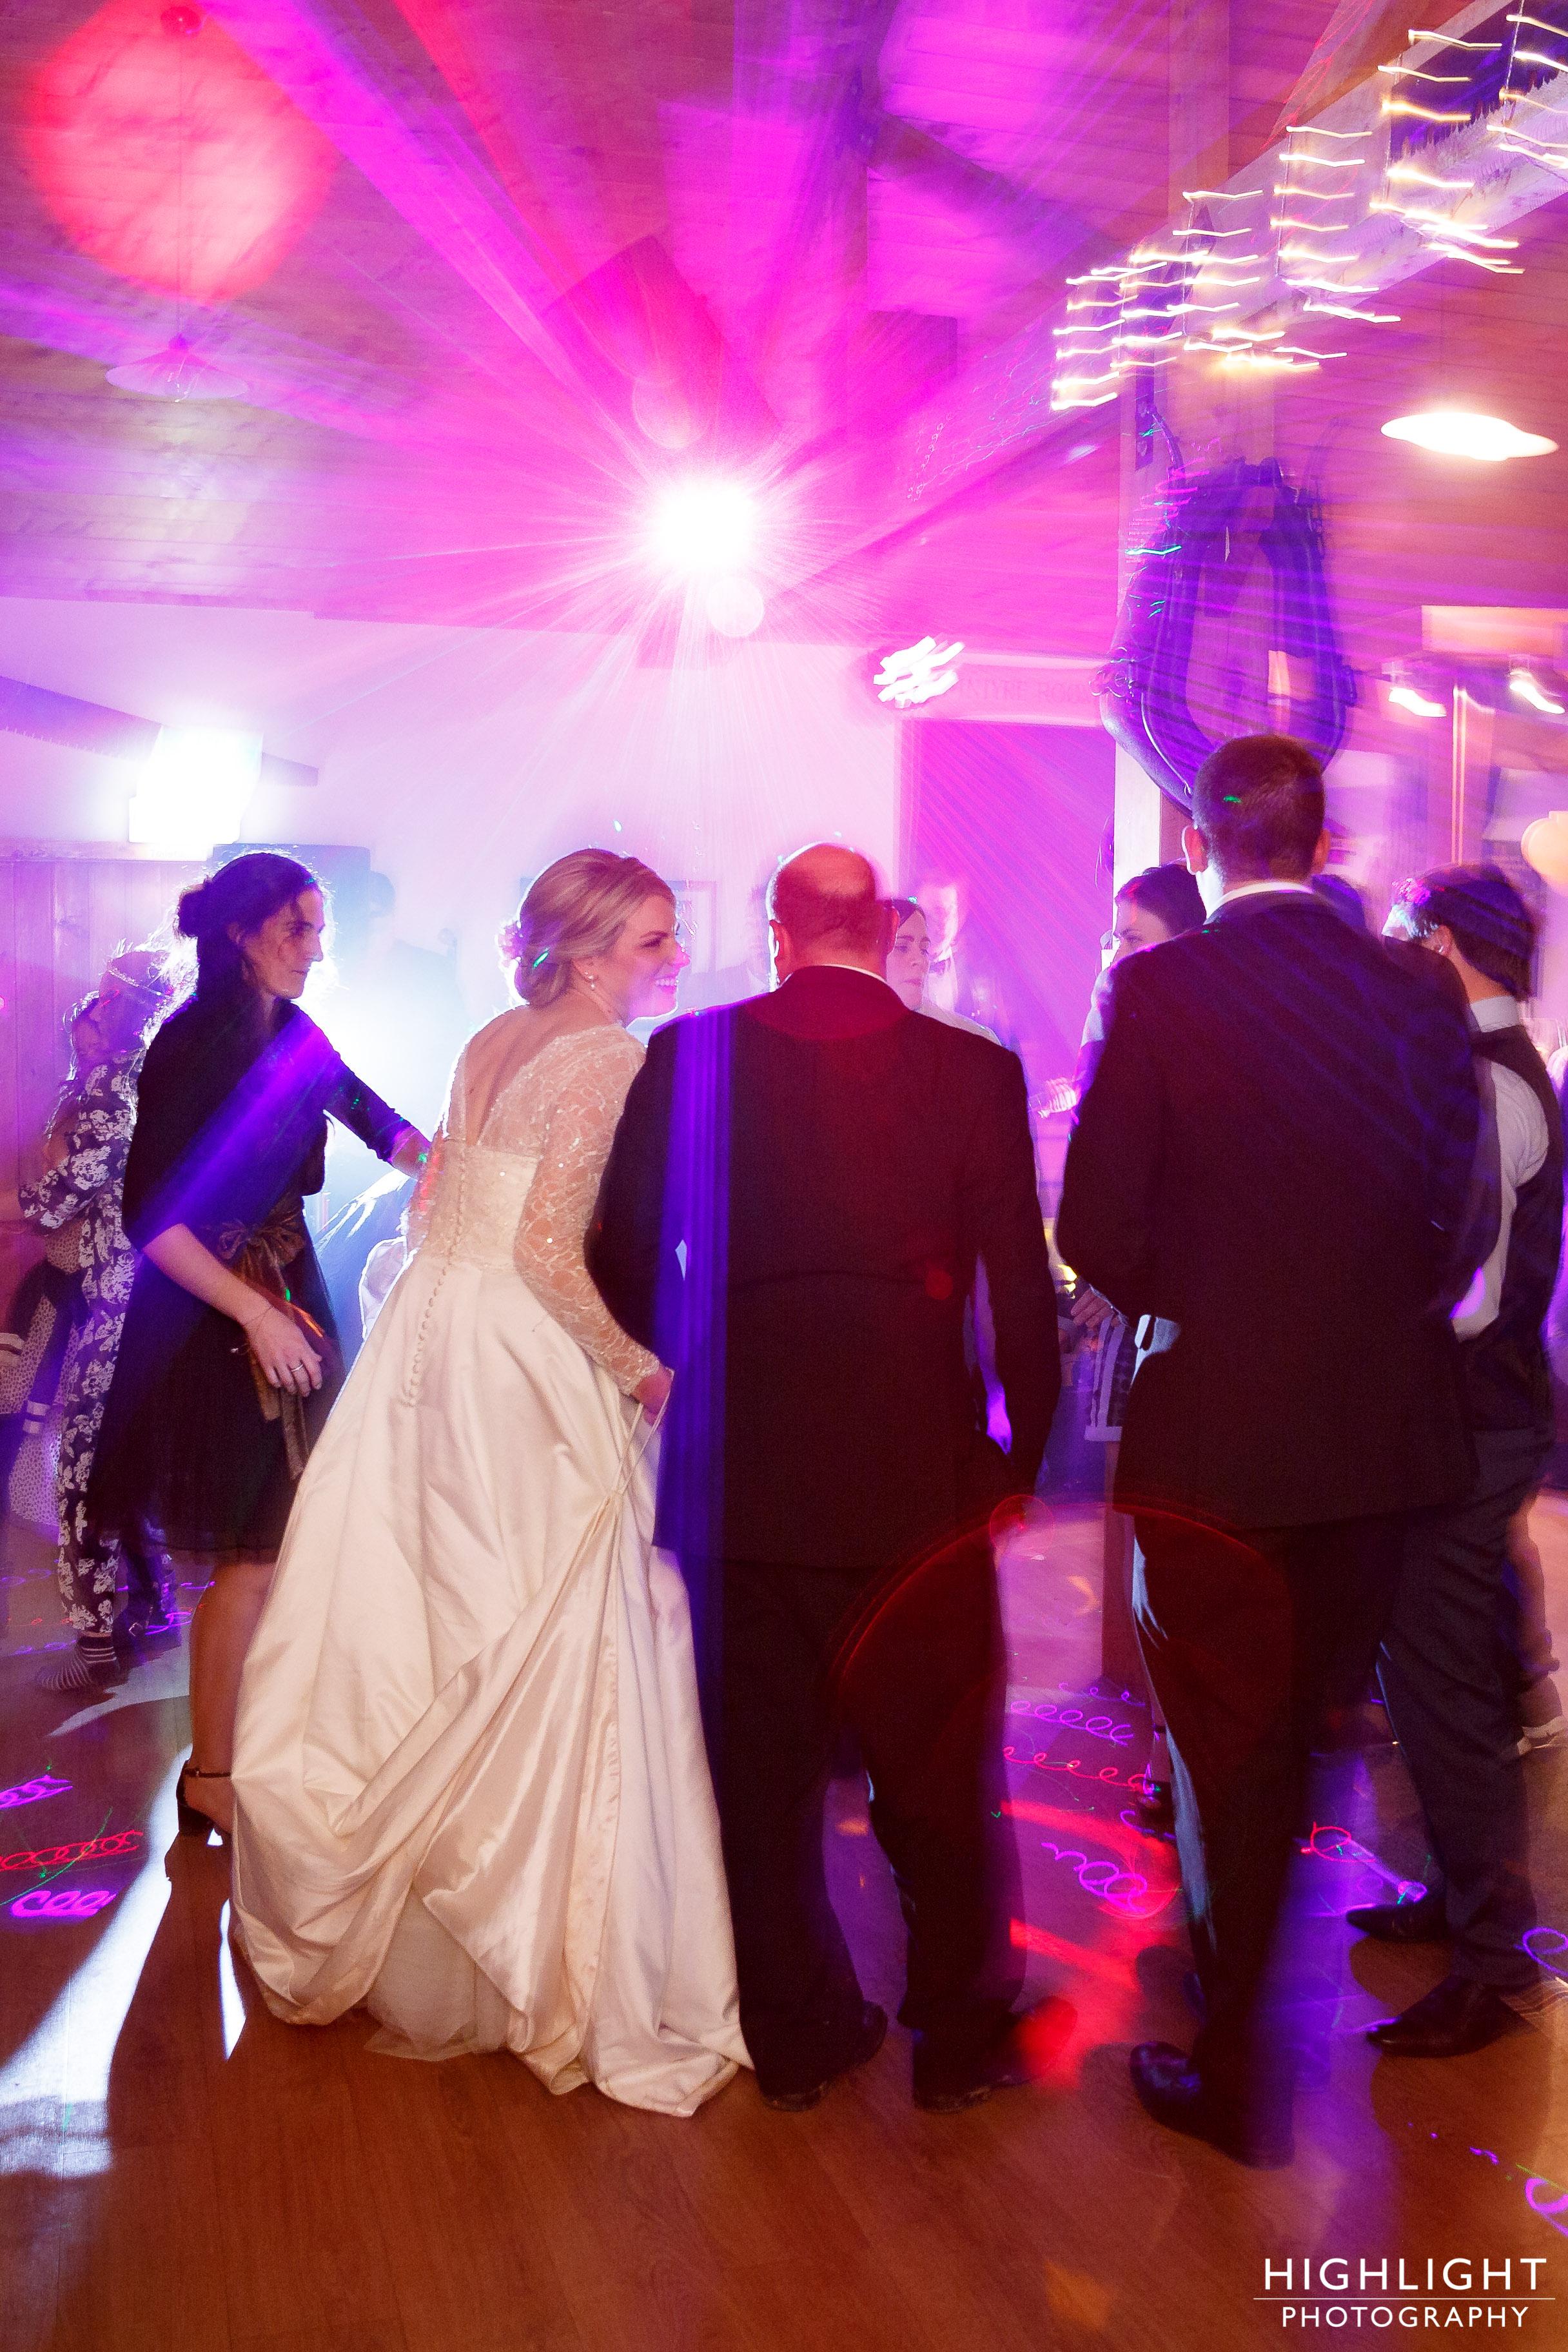 makoura-wedding-photography-highlight-new-zealand-93.jpg